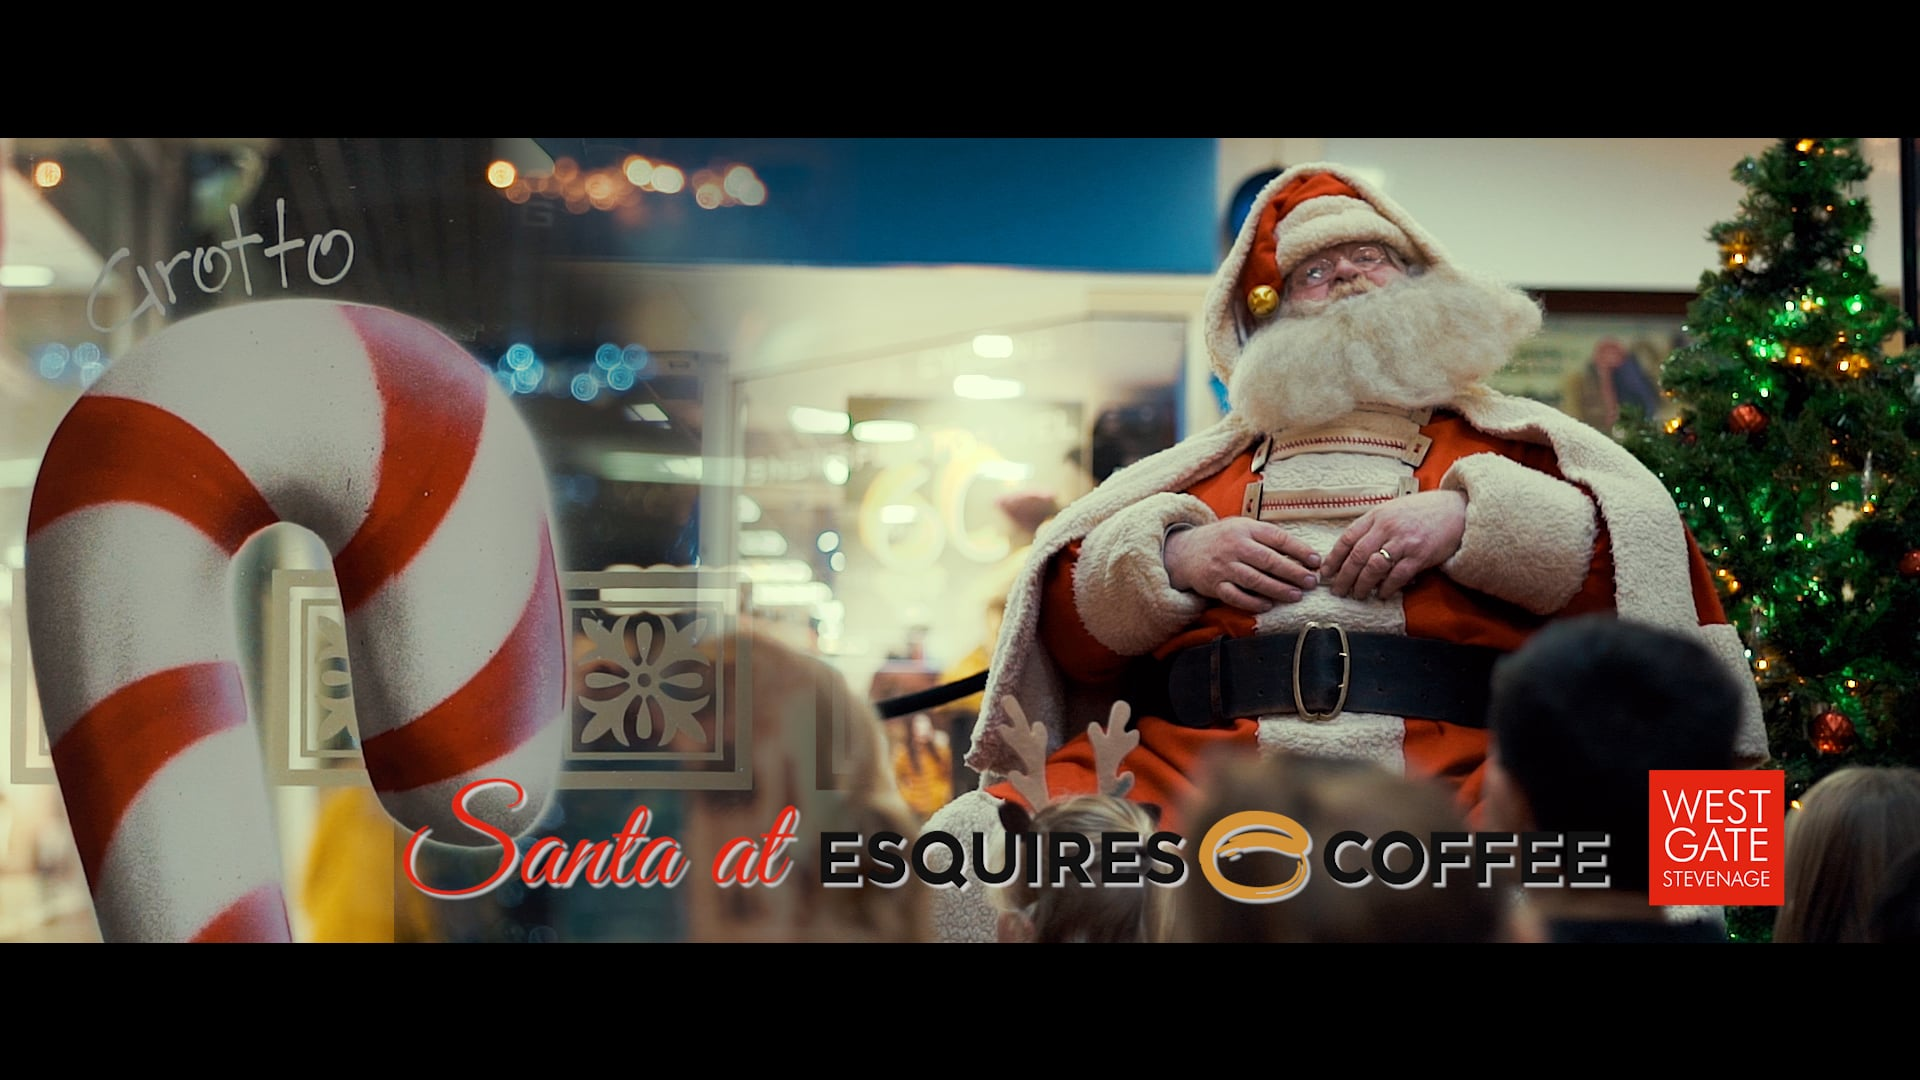 Santa at Esquires Coffee / Westgate Shopping Centre / Stevenage